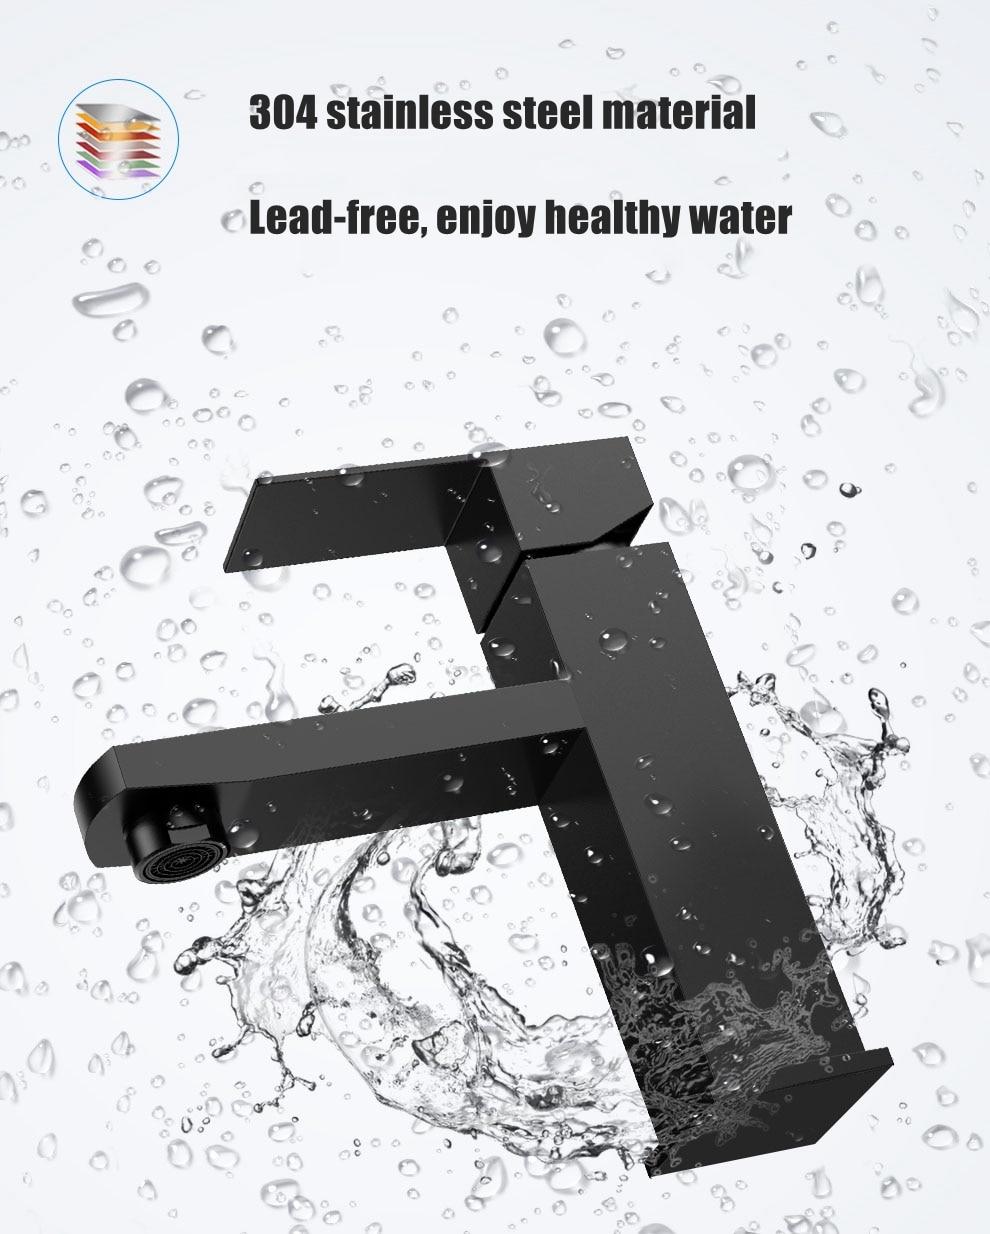 H3d7ba2d624f74393926b73df9e19ac5al XUNSHINI Black Square Bathroom Sink Faucet Single Handle Basin Faucet Wash Tap Bathroom Toilet Deck Mounted Basin Tap